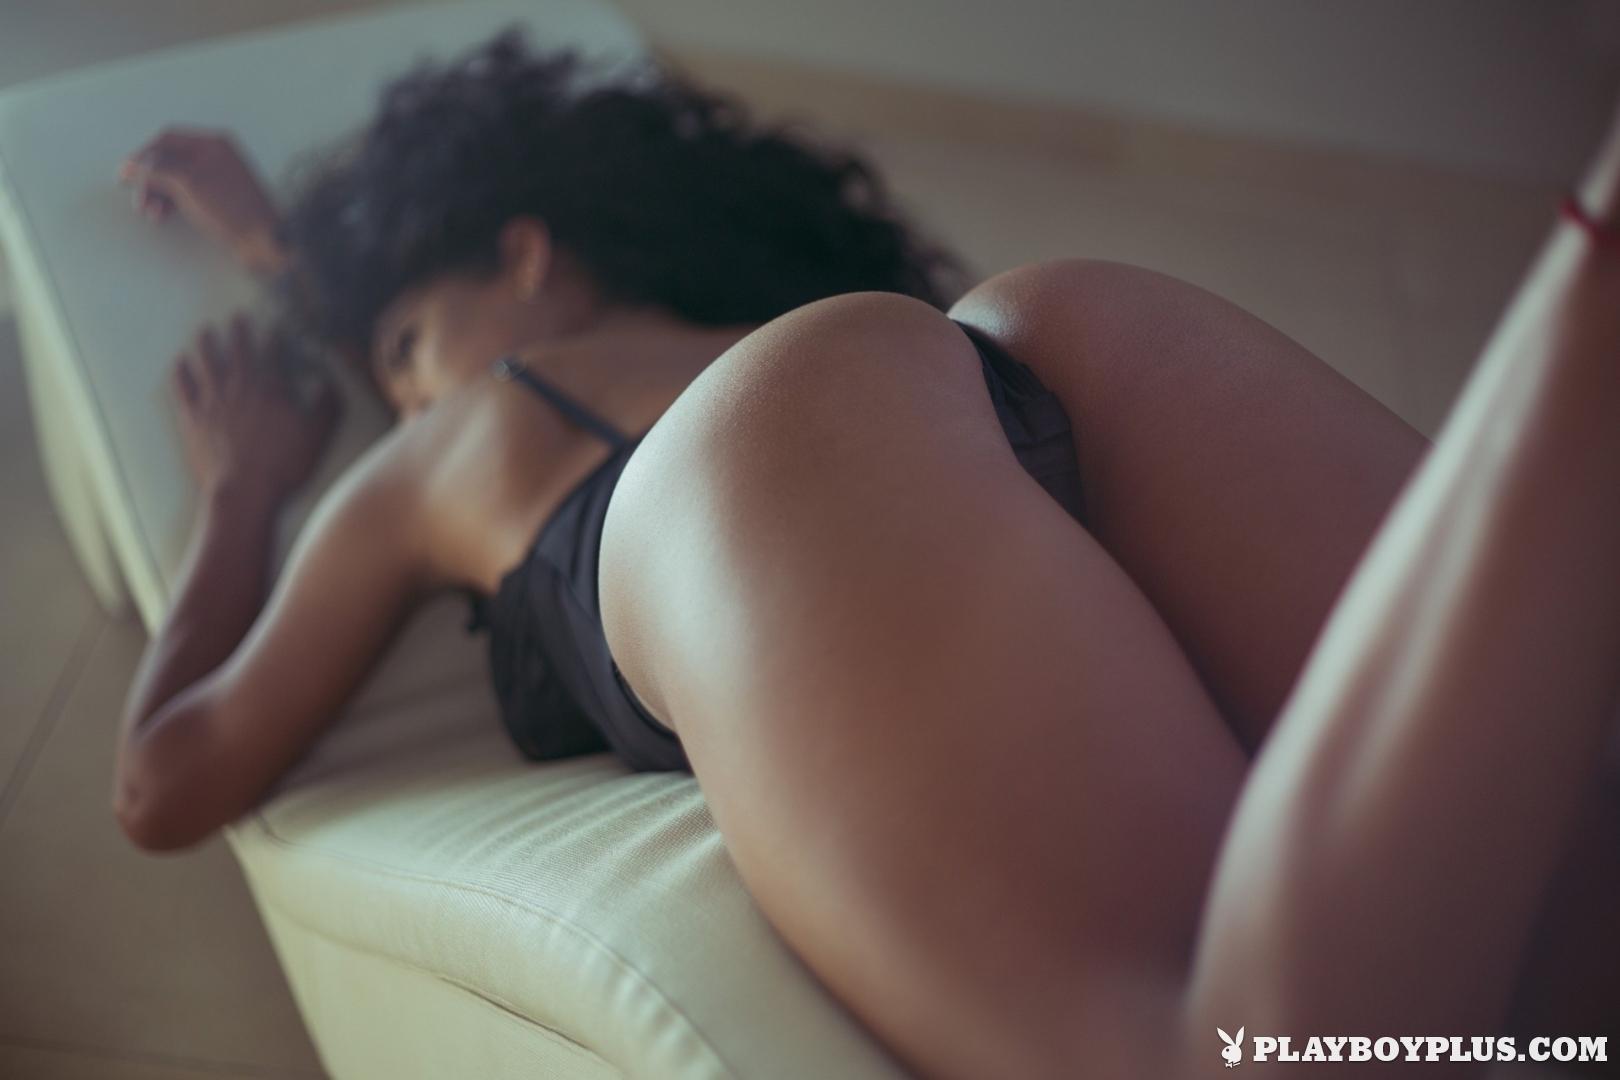 Playboy Plus | Kate Rodriguez in Playboy Argentina 10